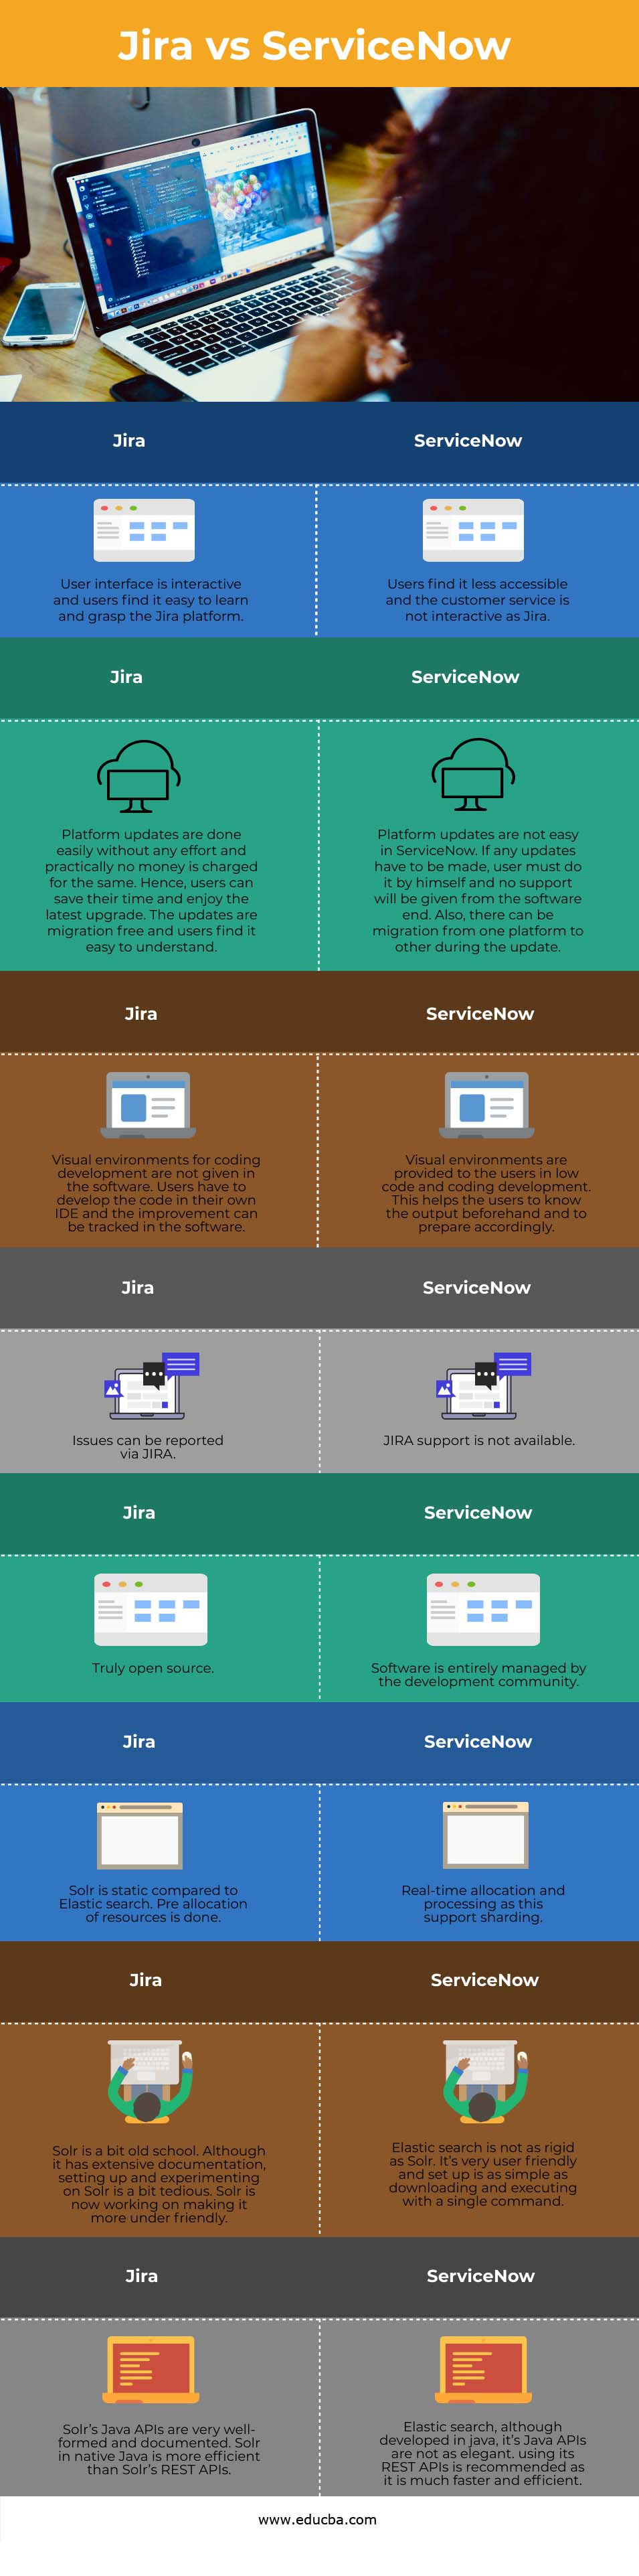 Jira vs ServiceNow info